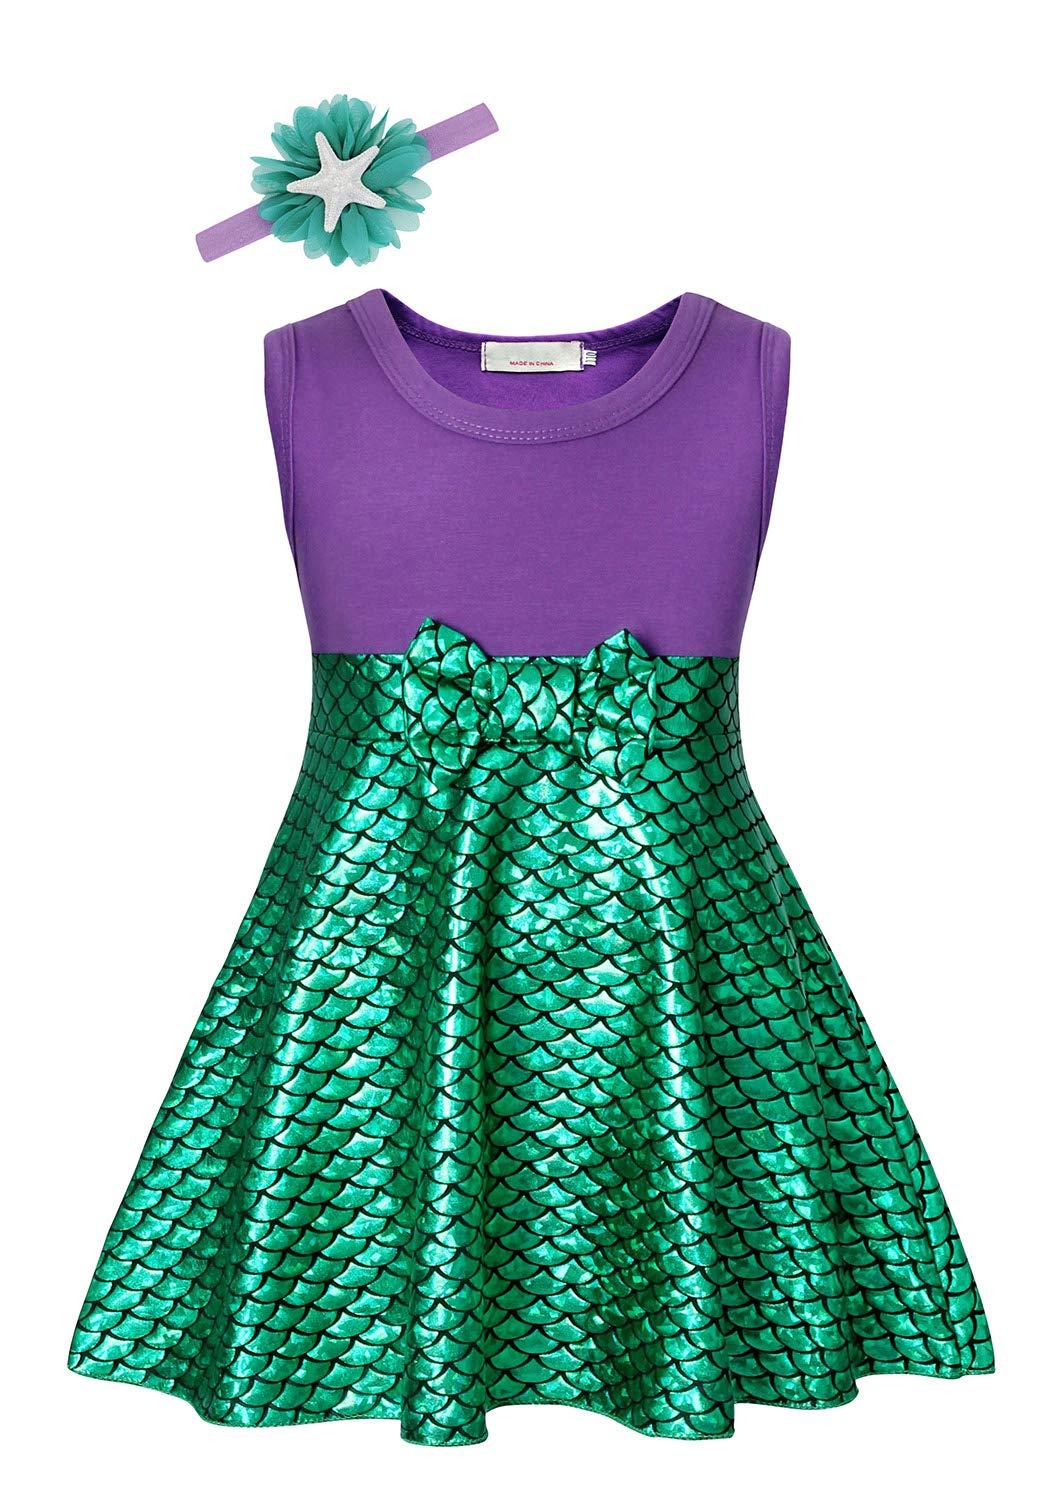 Cotrio Mermaid Costume Girls Princess Dresses Sleeveless Fish Scale Dress with Starfish Headband Halloween Cosplay Size 10 (6-7 Years, Green Purple, 140)